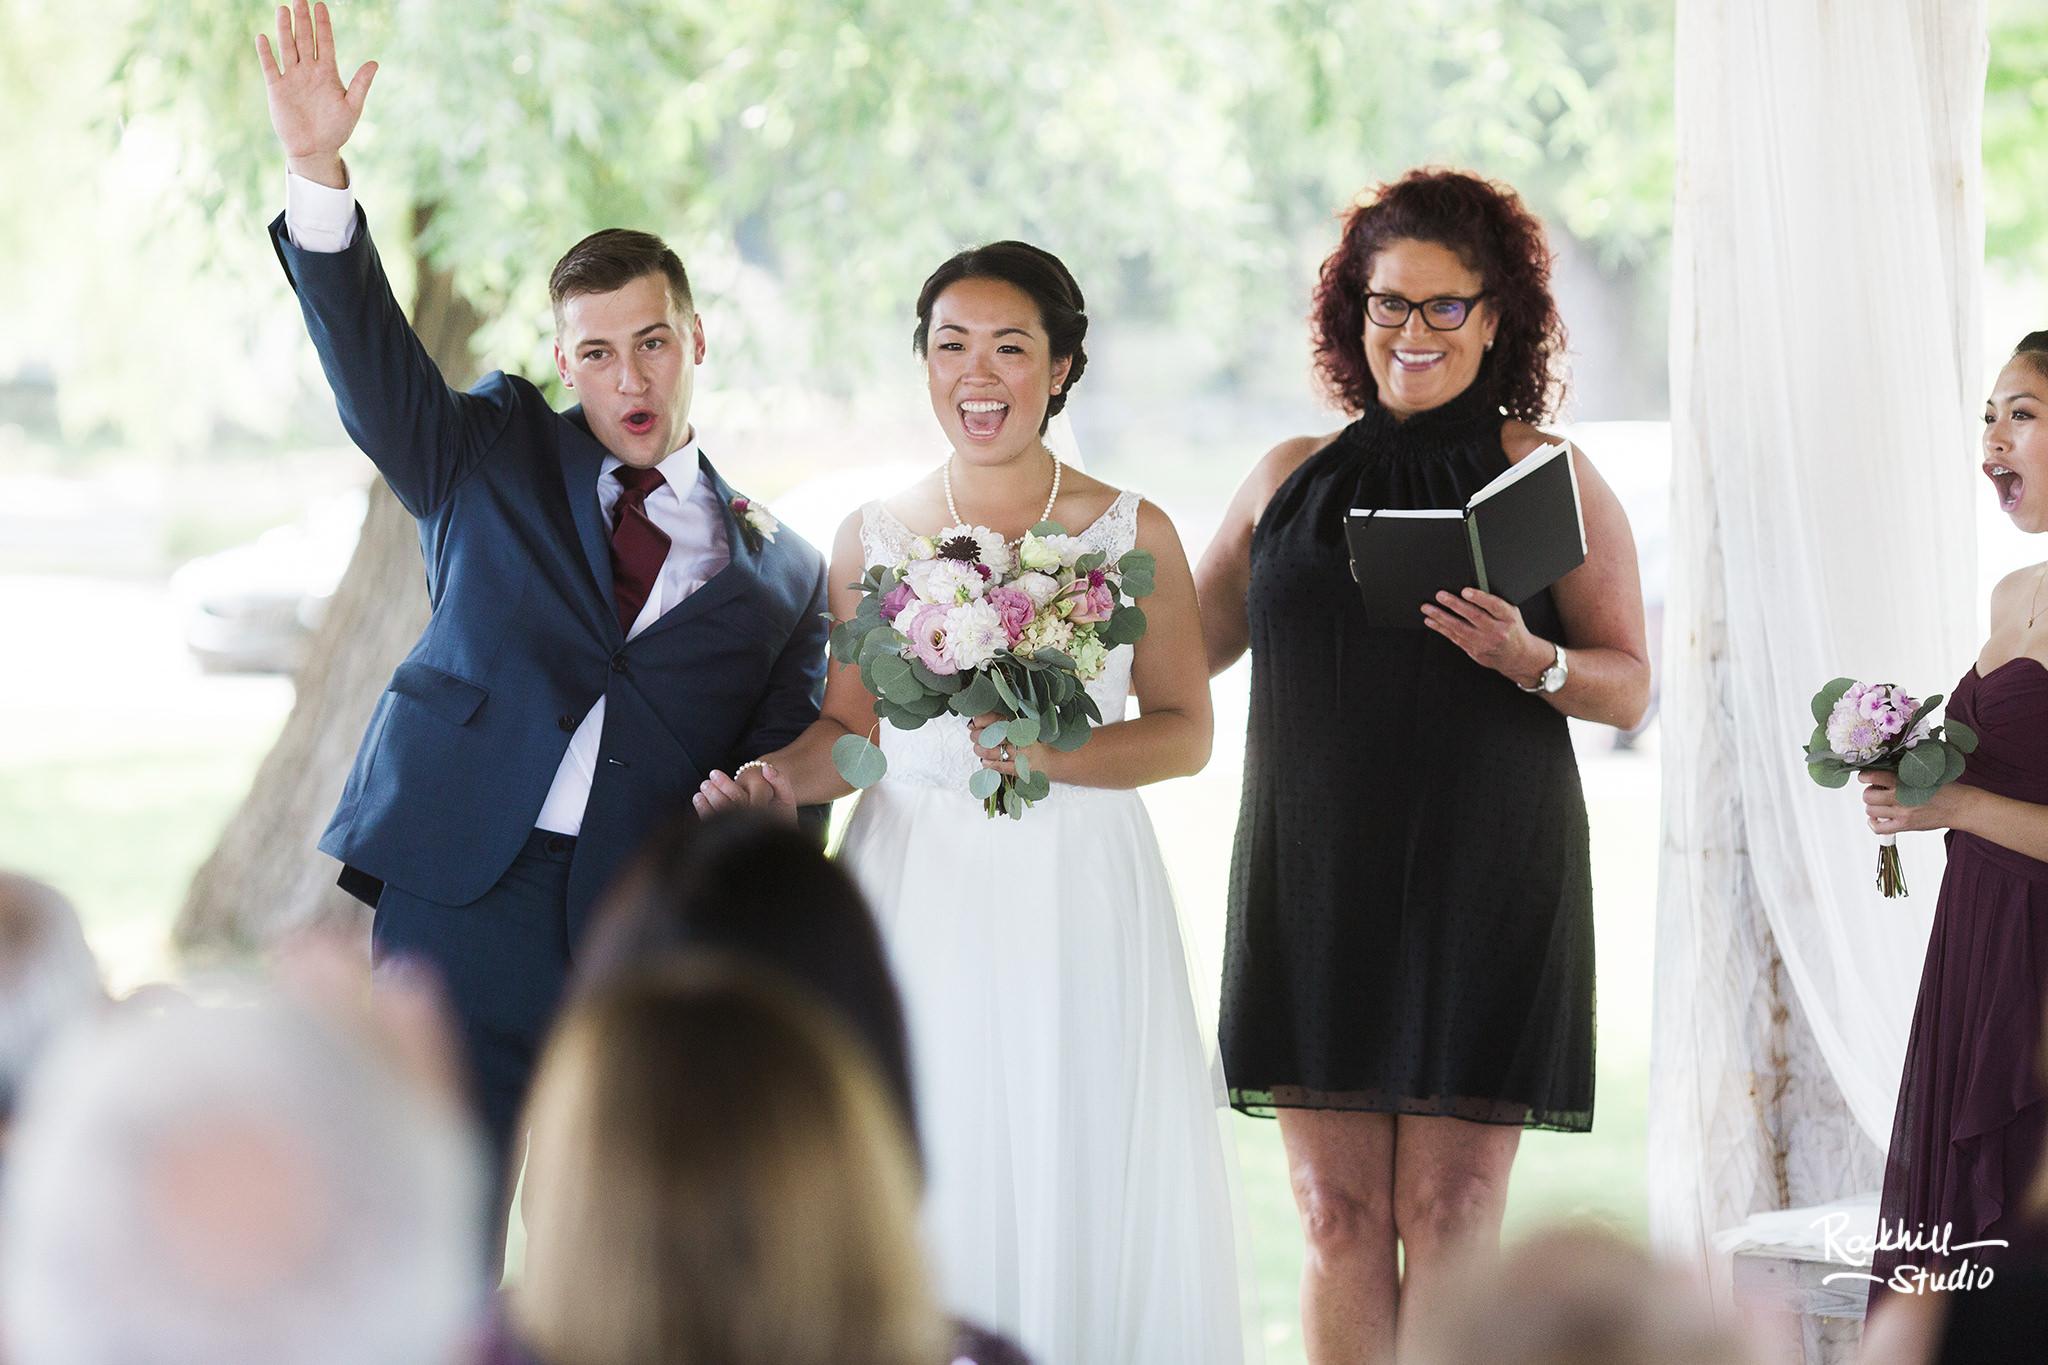 Northport wedding ceremony, traverse city wedding photographer rockhill studio